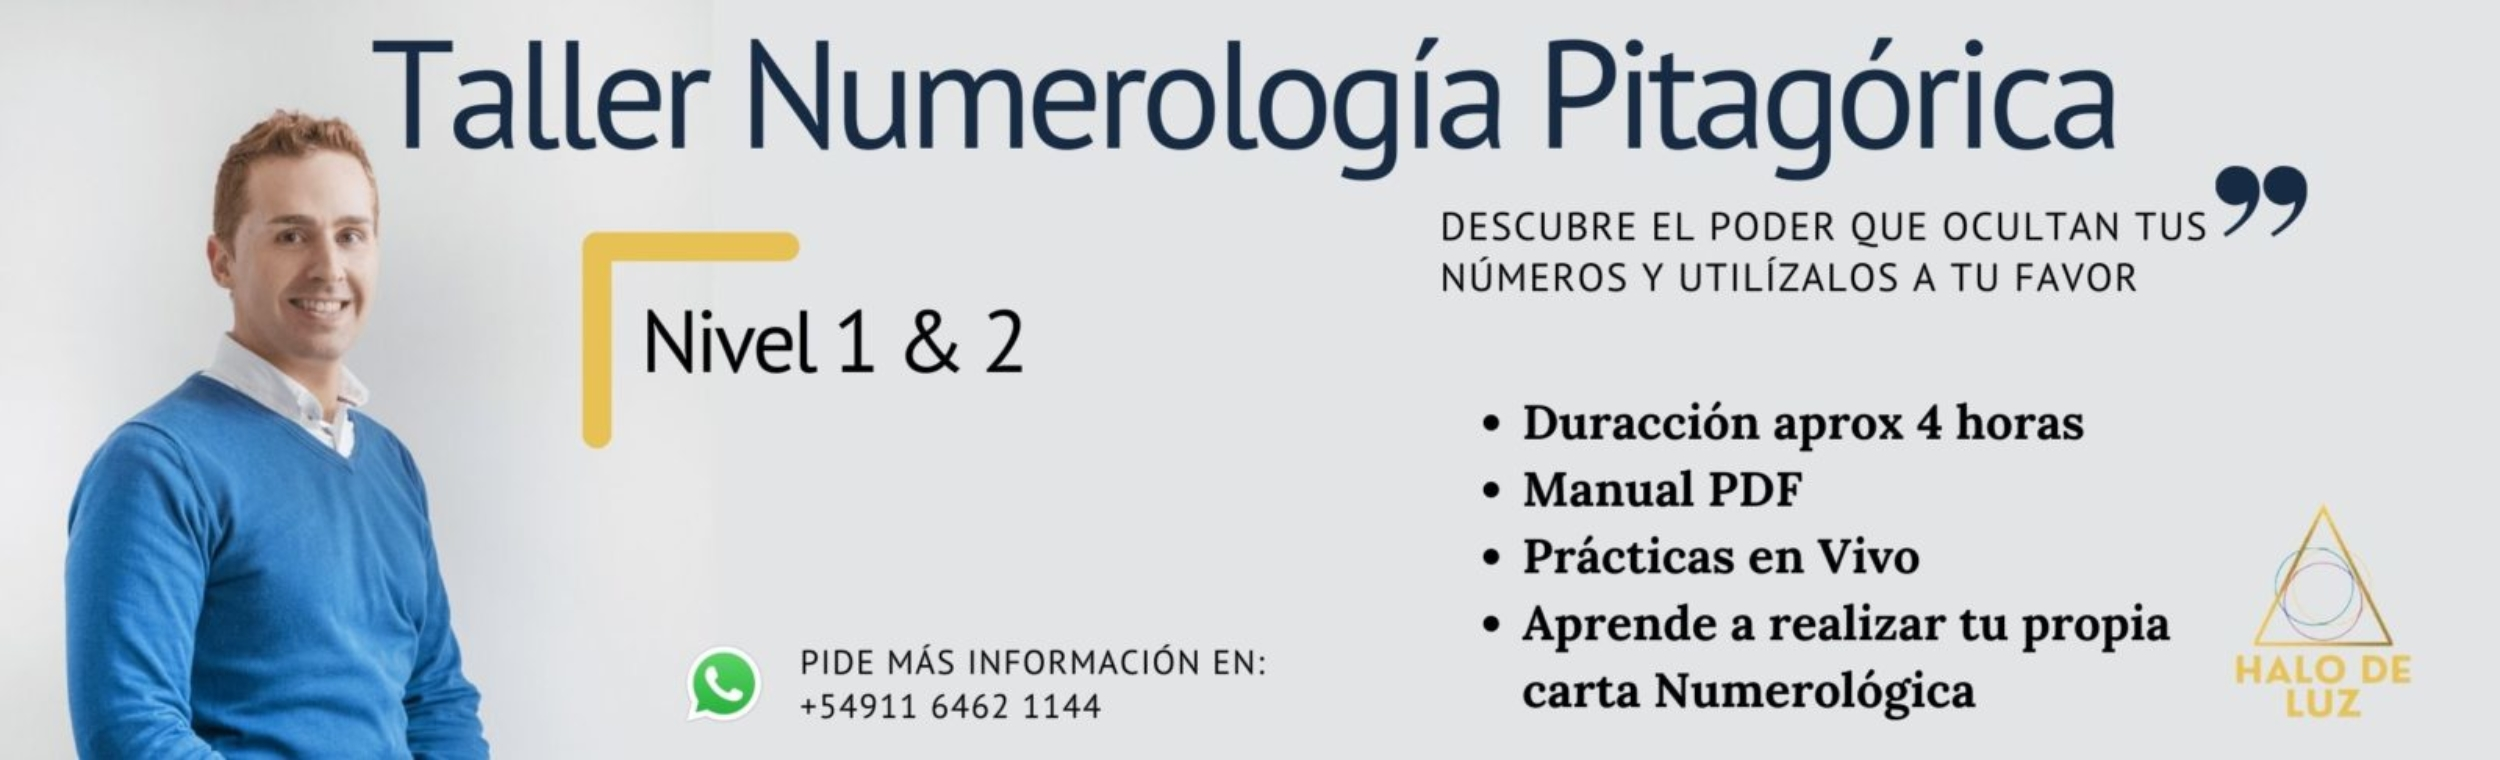 21-02-18 Slider home taller numerología pitagórica